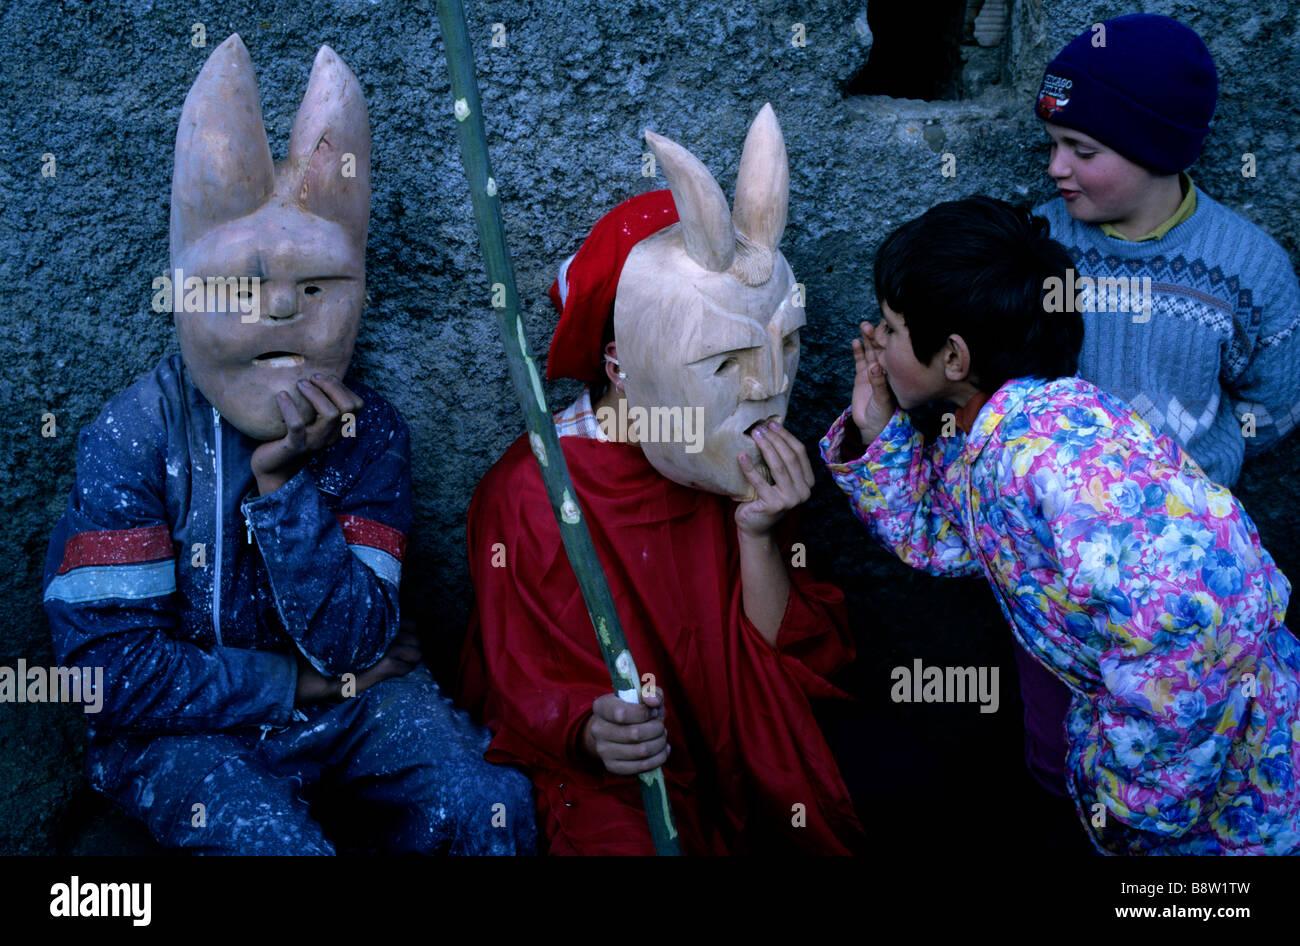 "Children tease two masked ""devils"" during the Caretos de Lazarim Carnaval festival in central Portugal's Douro region Stock Photo"